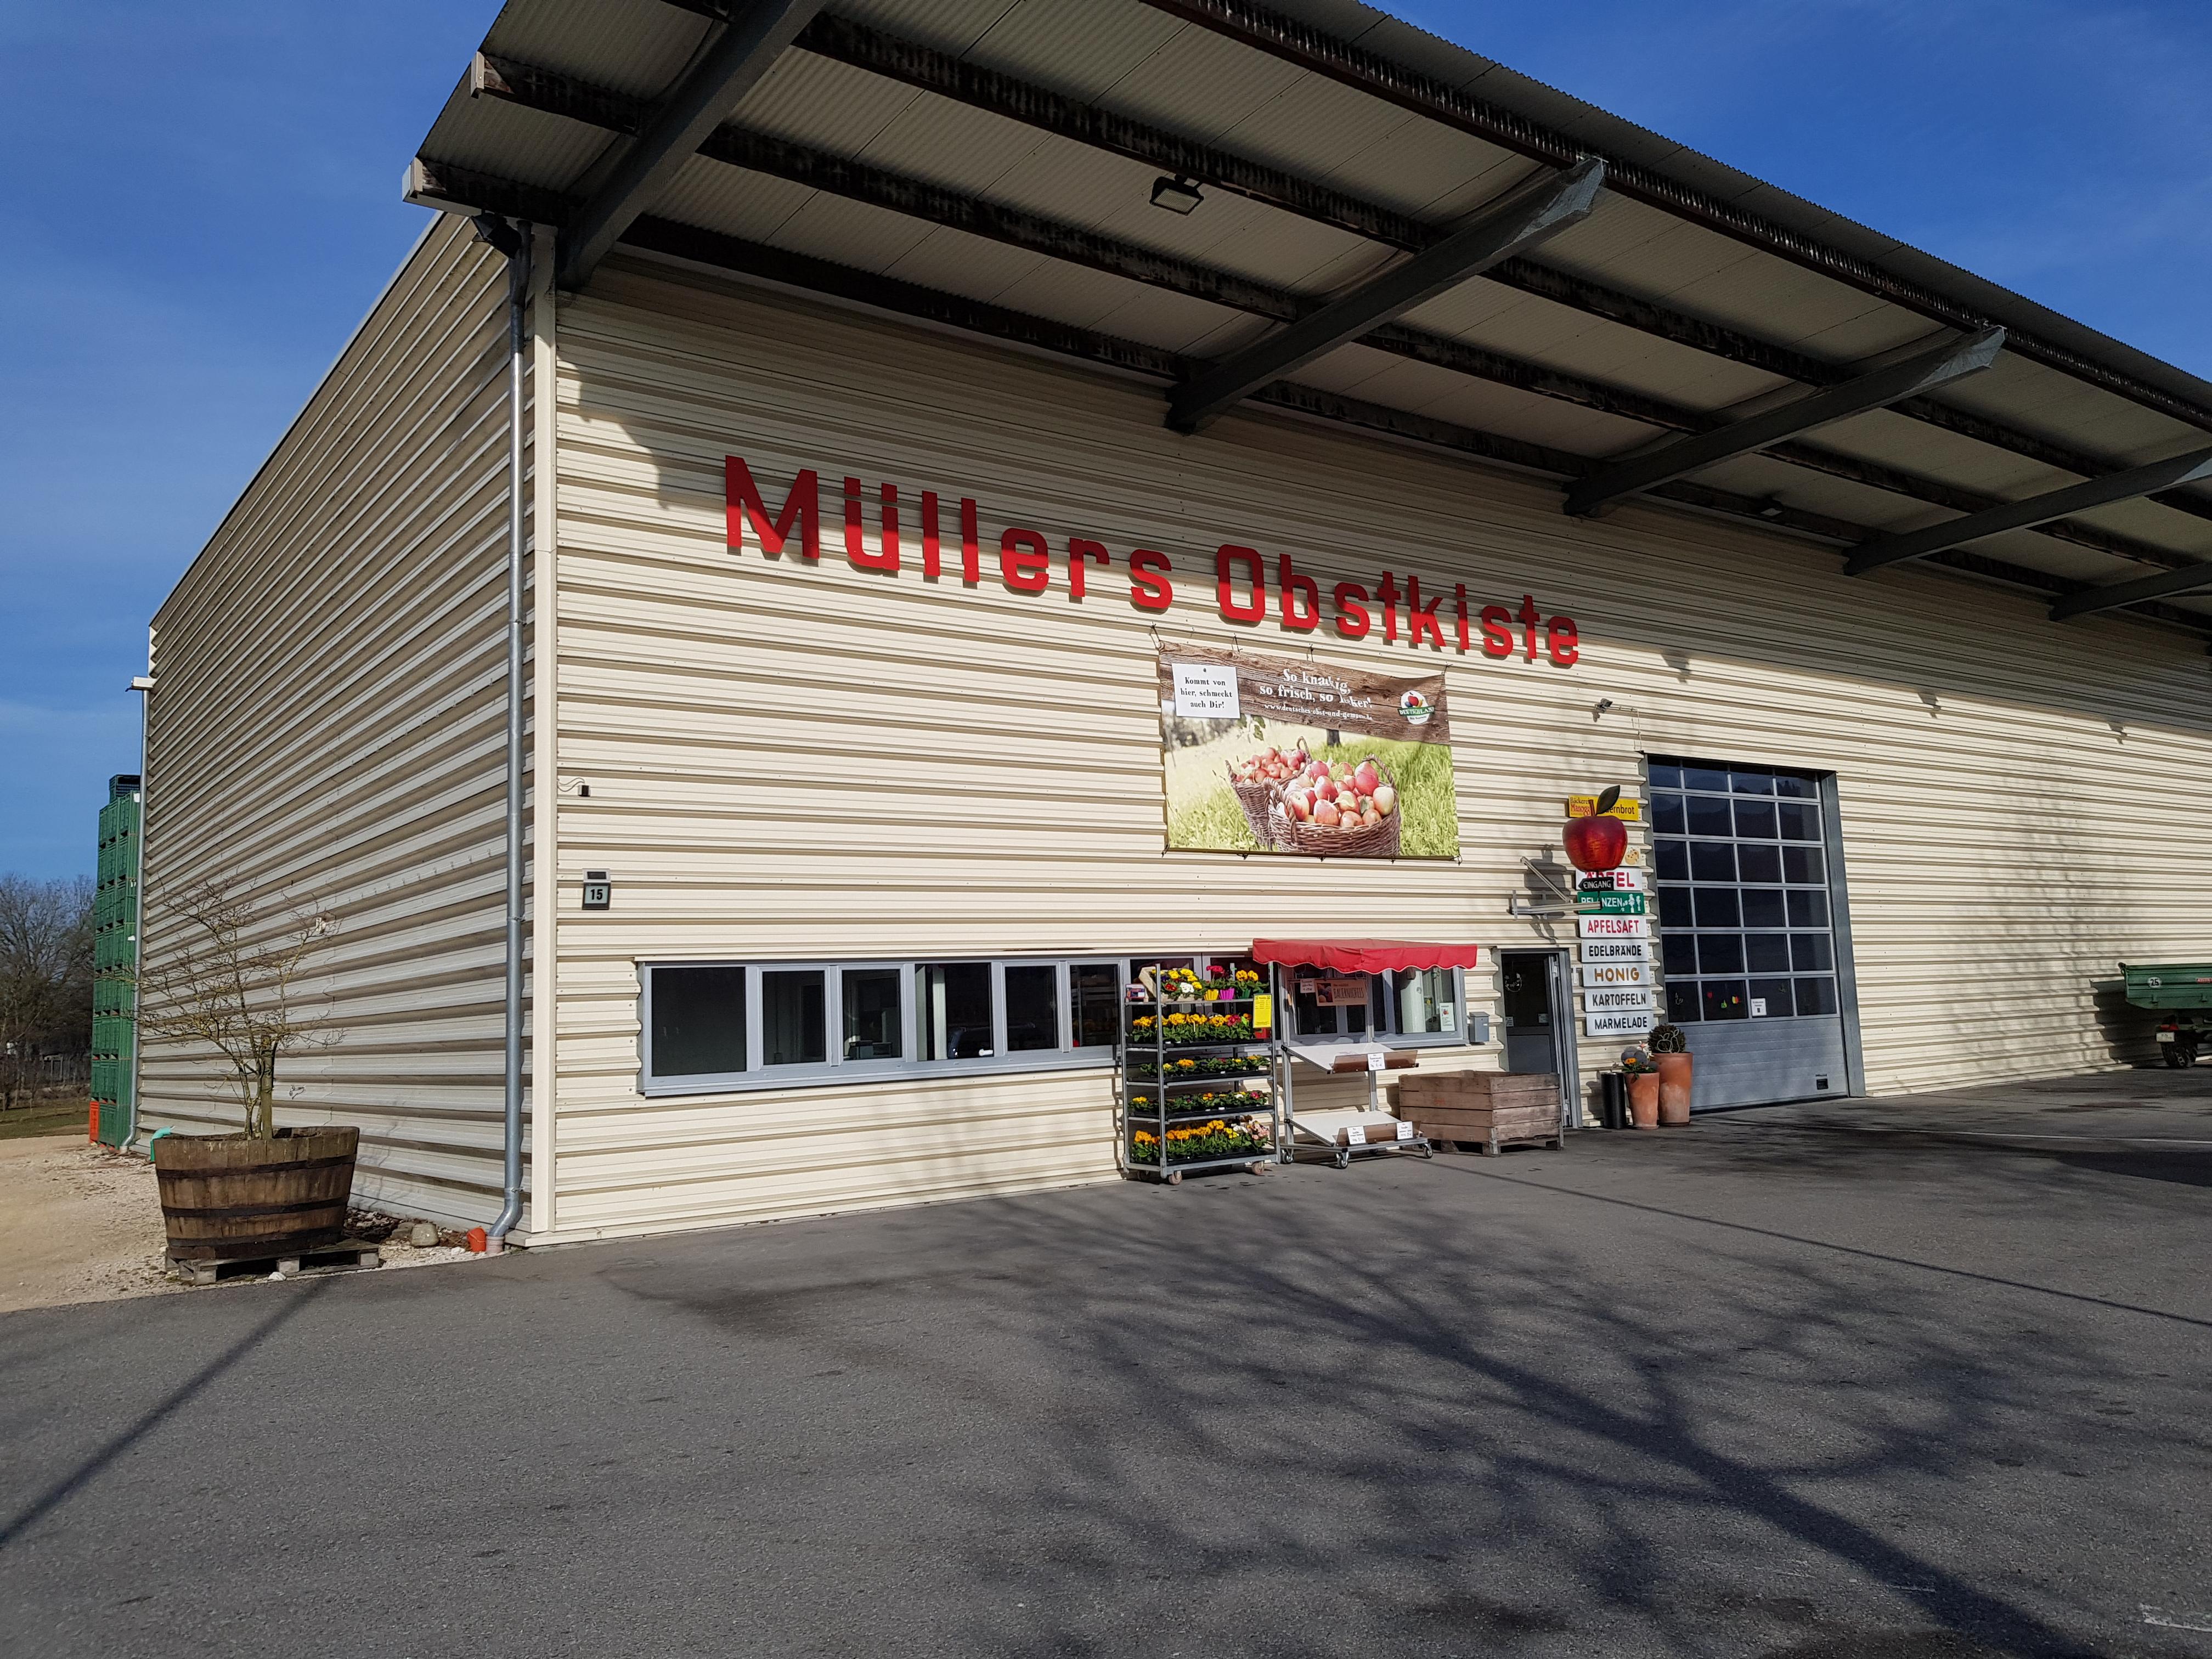 Müllers Obstkiste